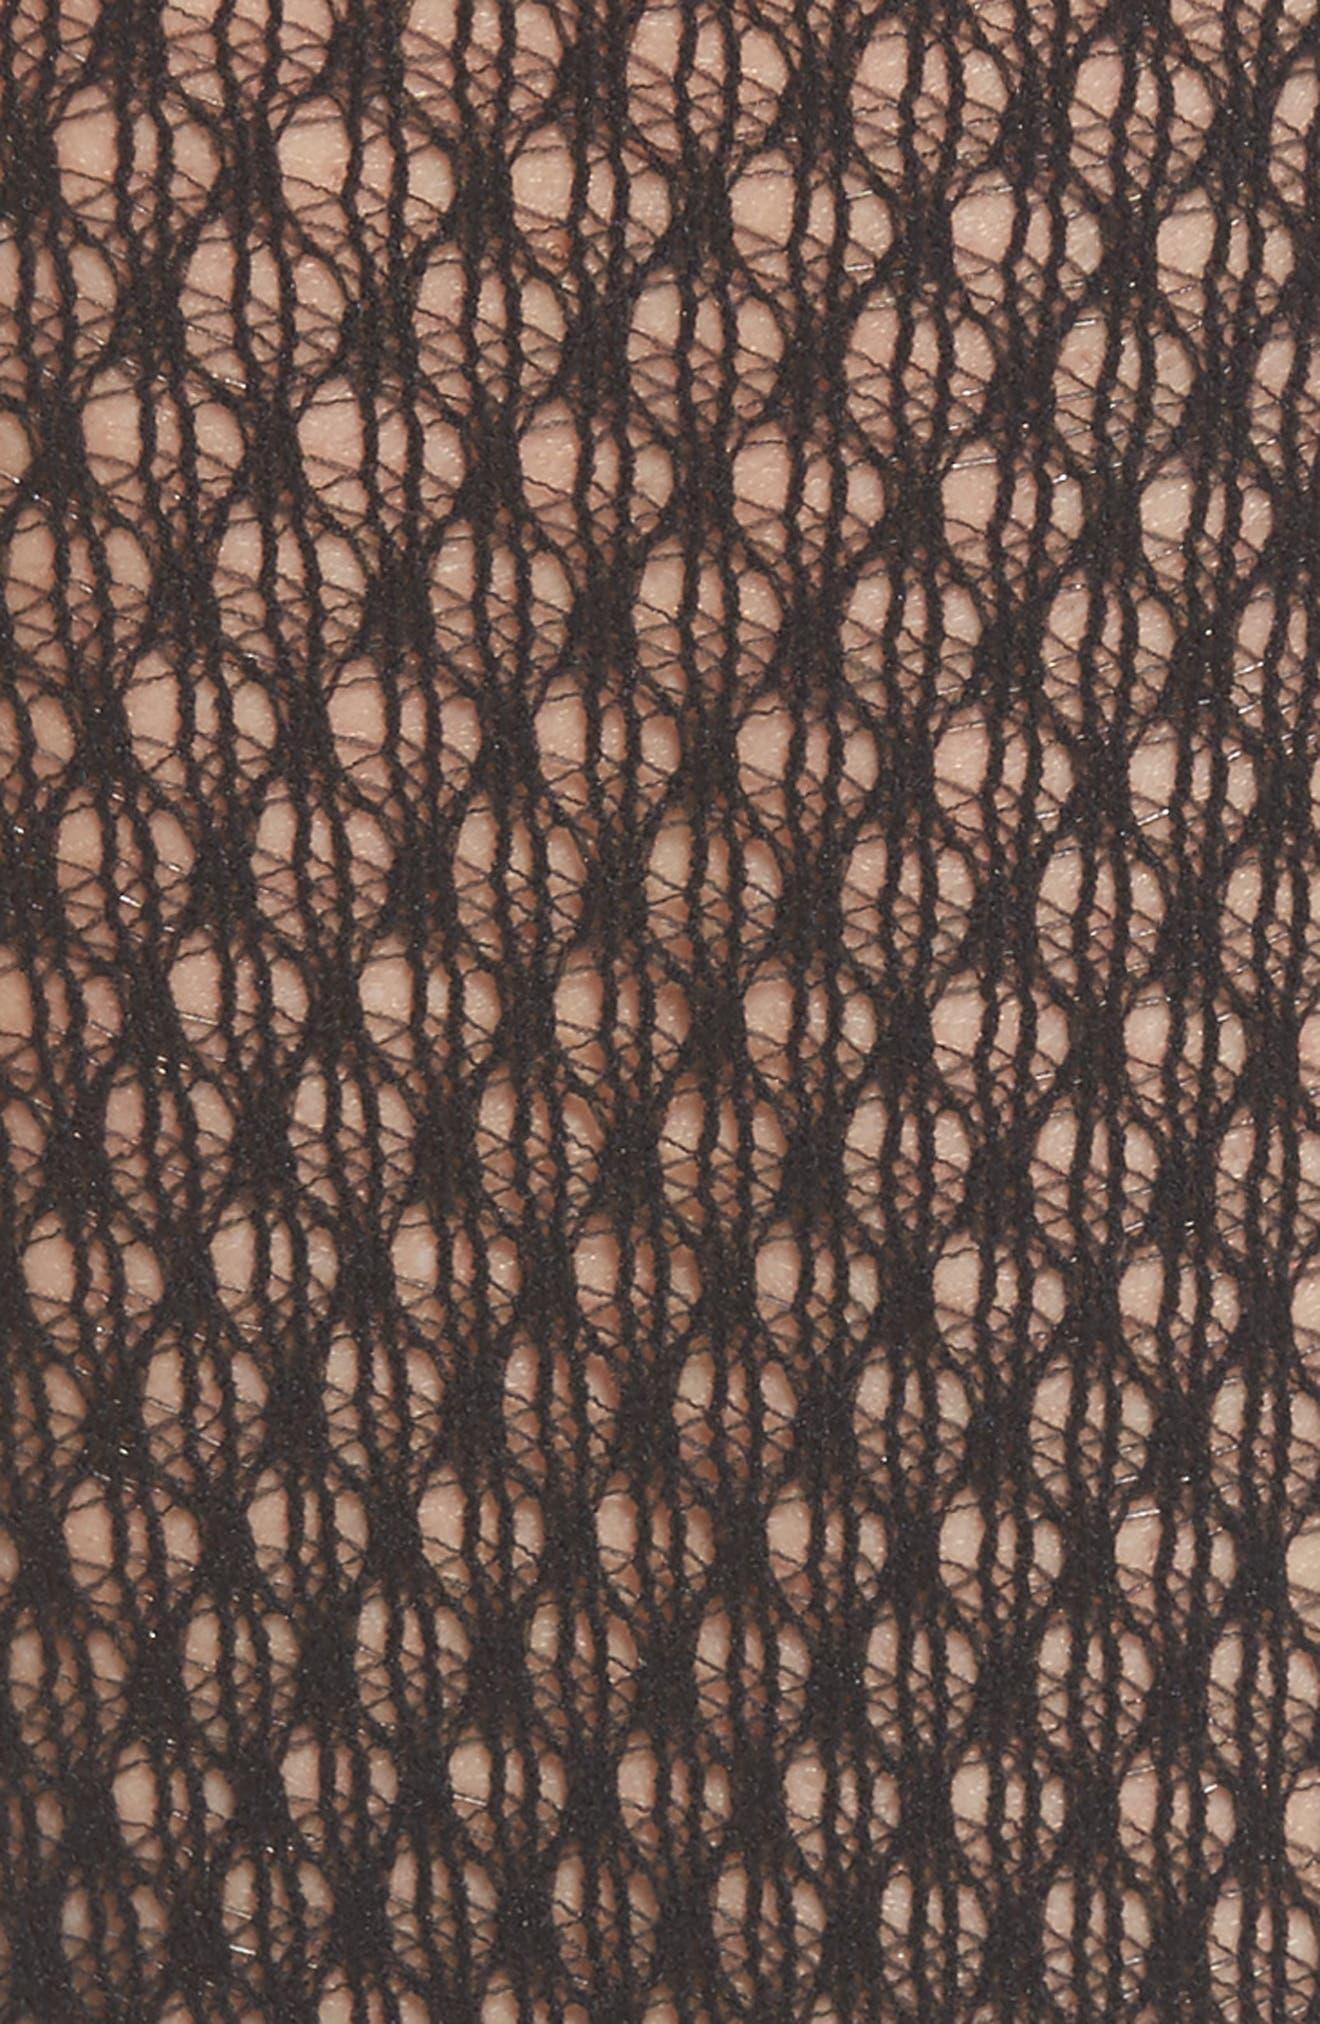 Alternate Image 3  - Wolford Rhomb Net Knee High Stockings